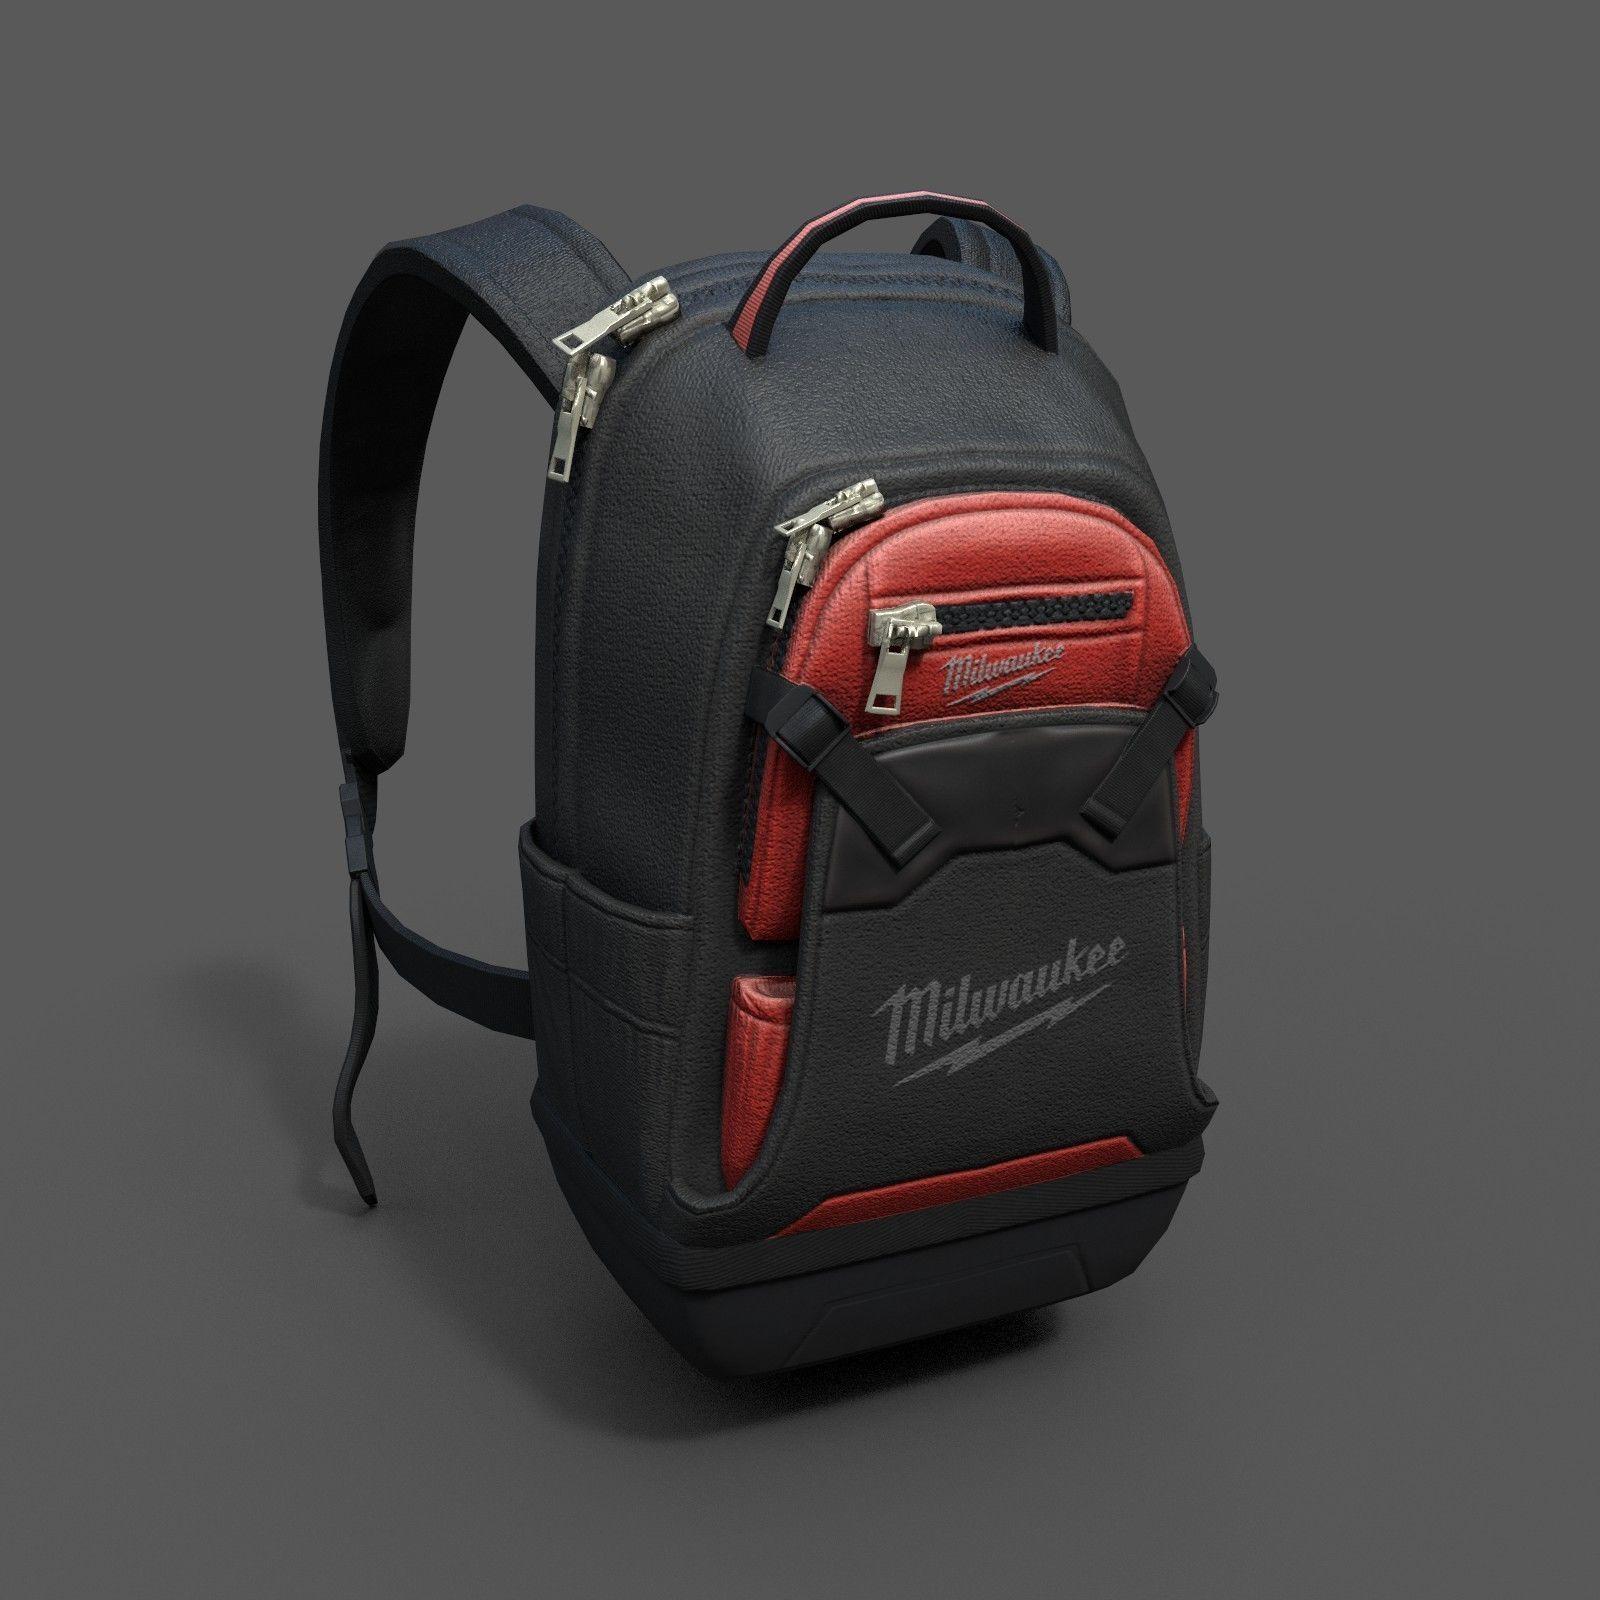 Human Backpack scifi